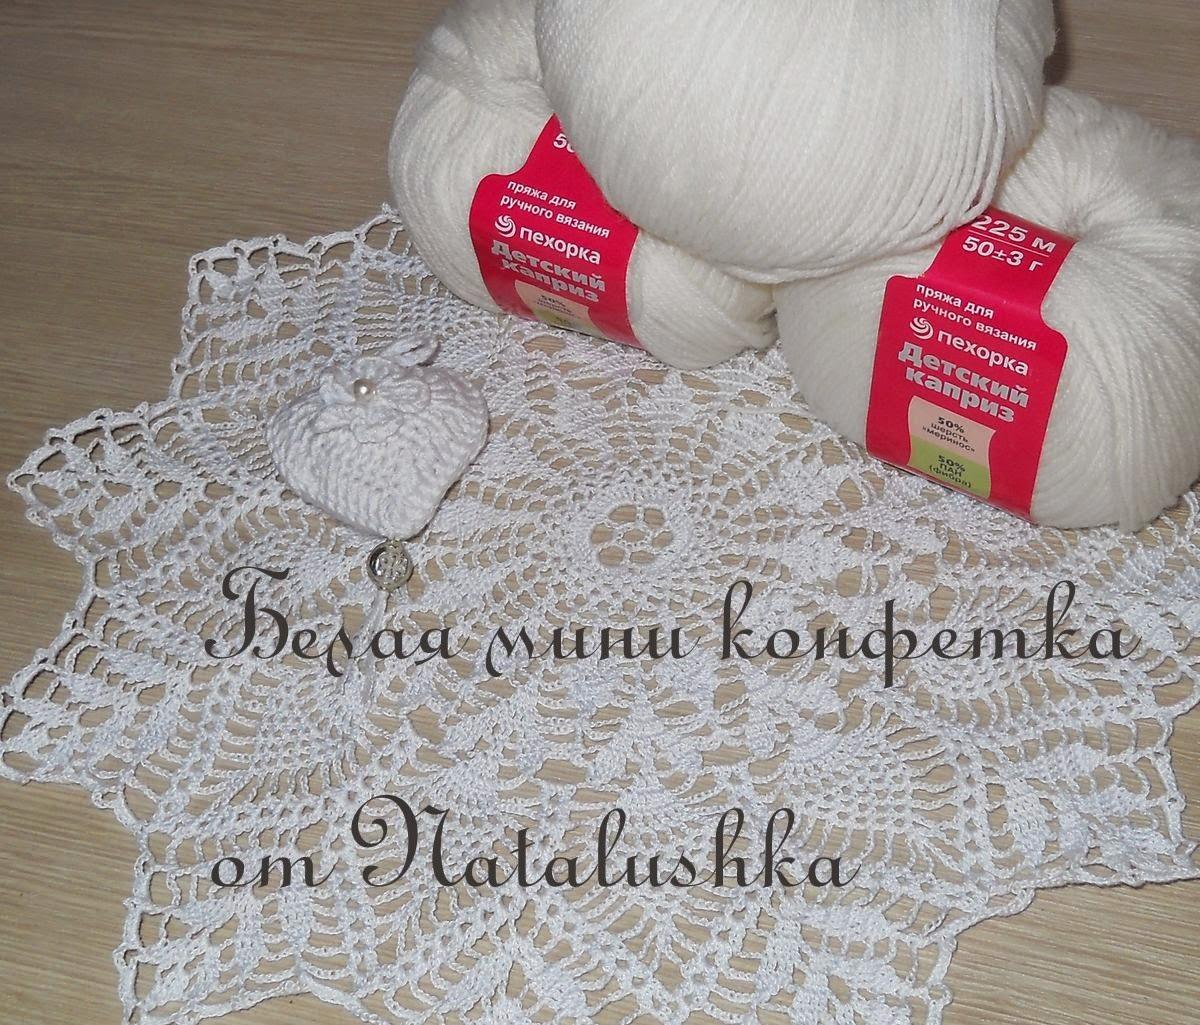 Белая мини-конфетка до 9 октября